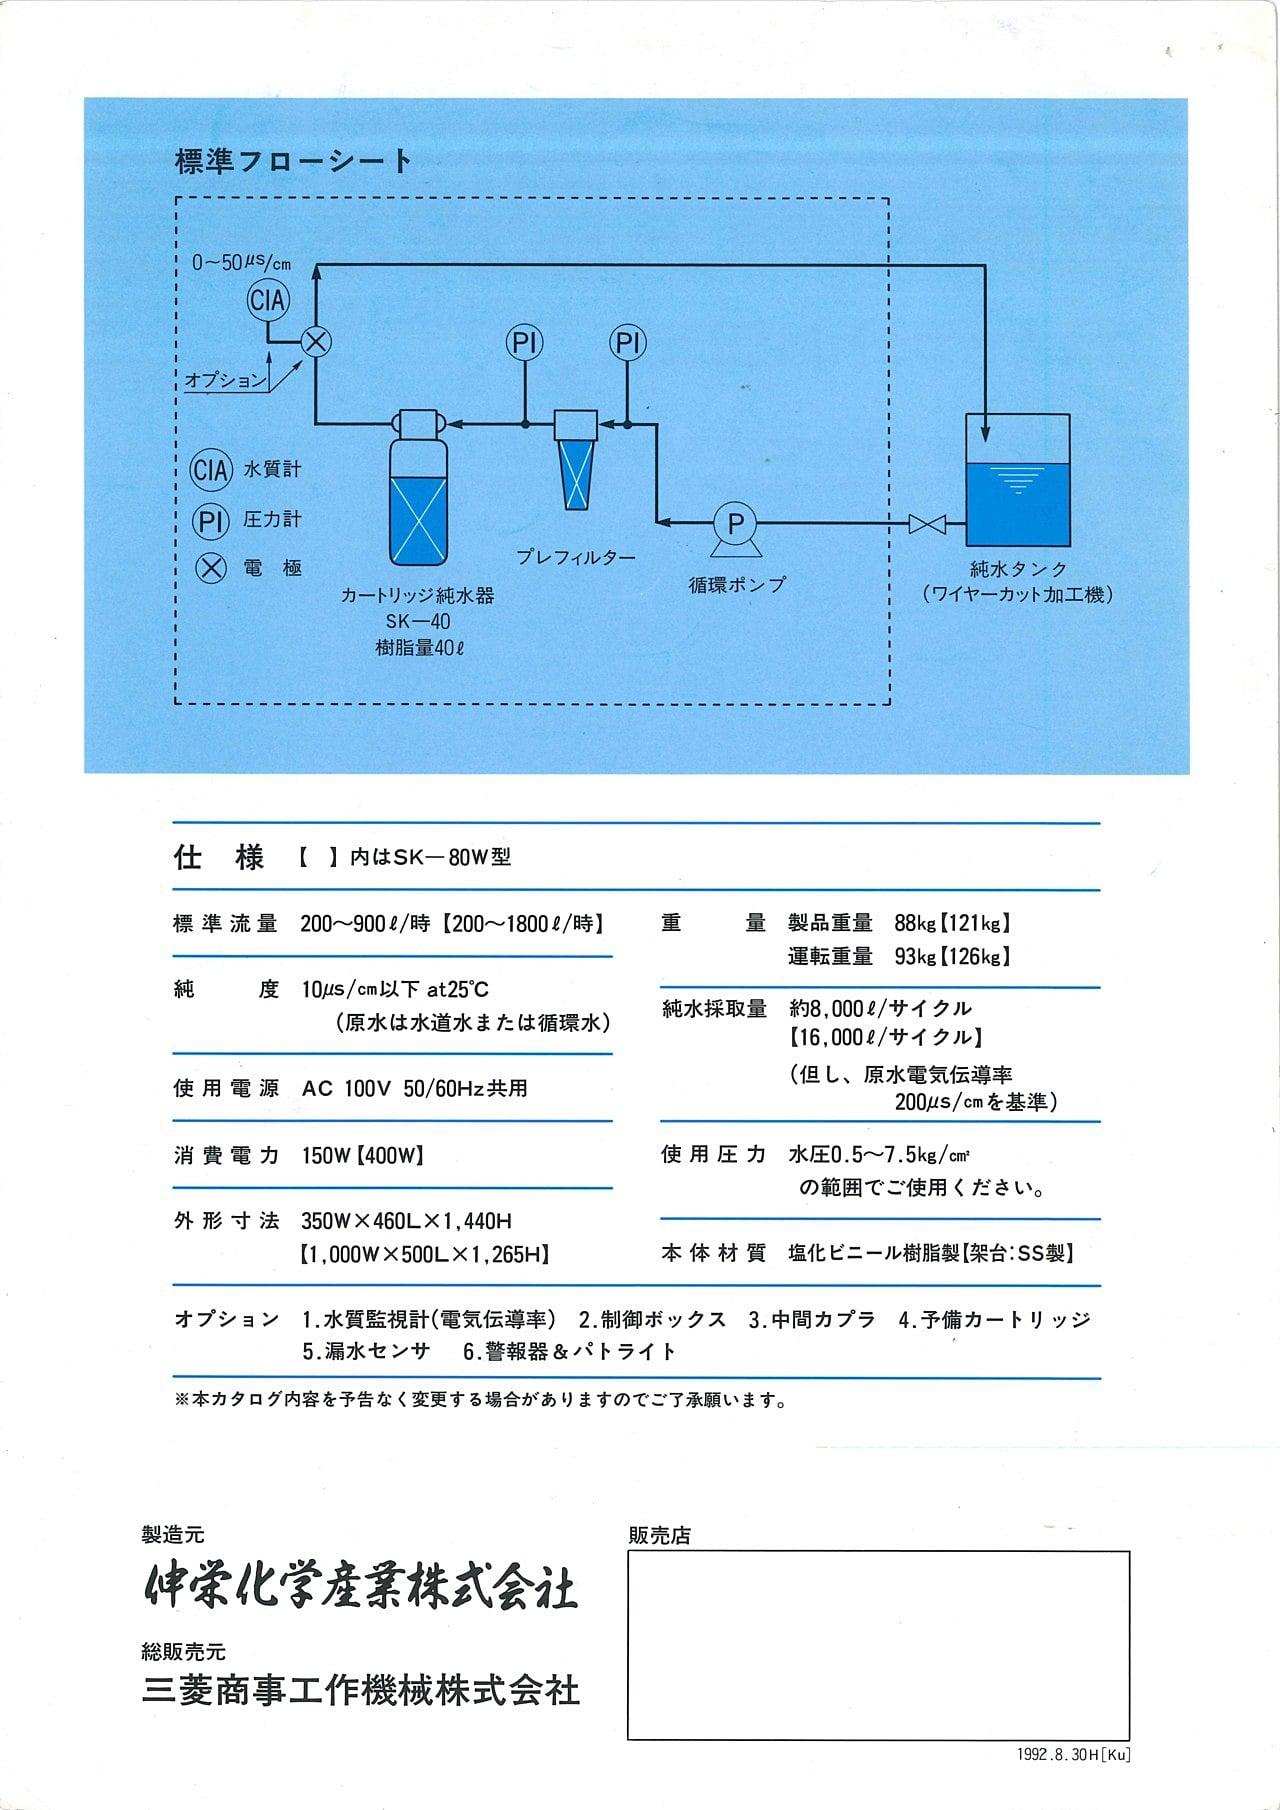 Wire Electric Discharge Method Machineshineikagakusangyo Mashins Wiring Diagram Wires Reproduction Ion Exchange Equipment Edi Uv Sterilizer Ro Film Misato Shi Saitama